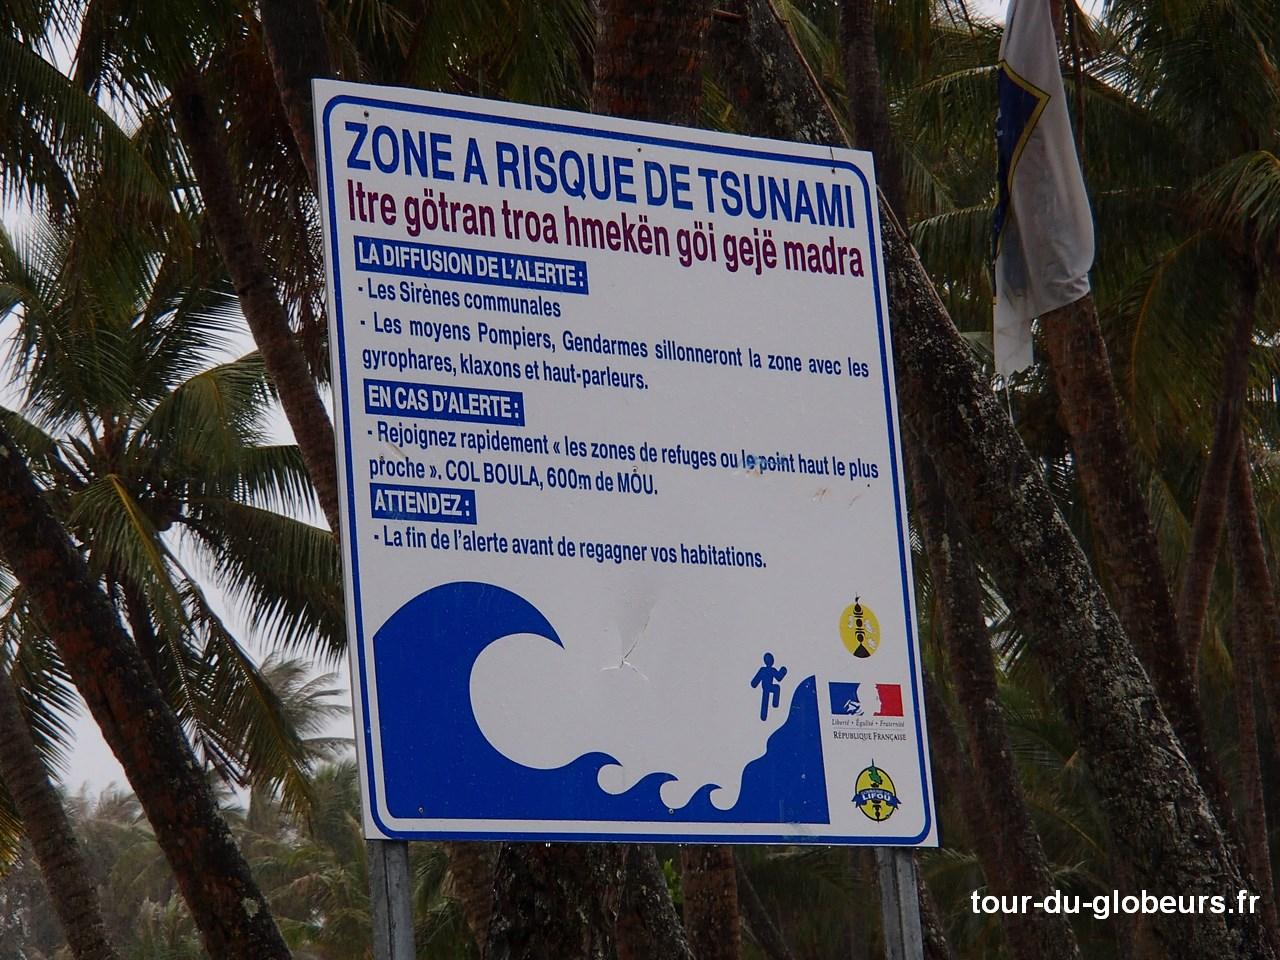 Nme-Calédonie - Lifou - Risque Tsunami